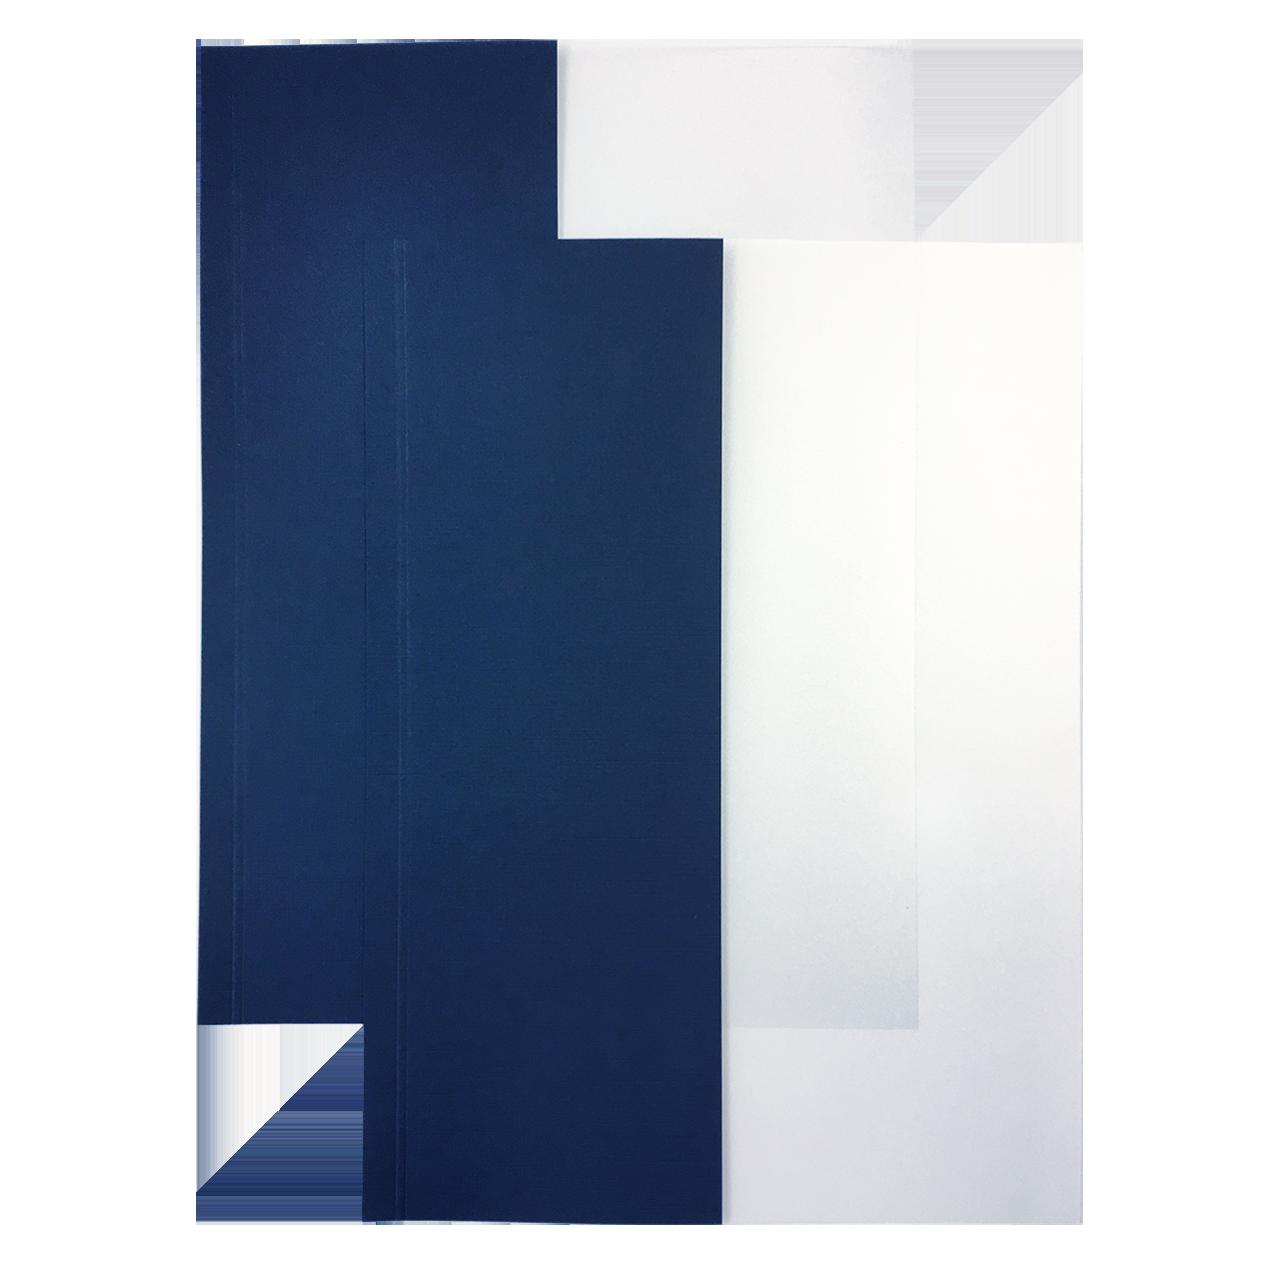 Planax Surebind Cover